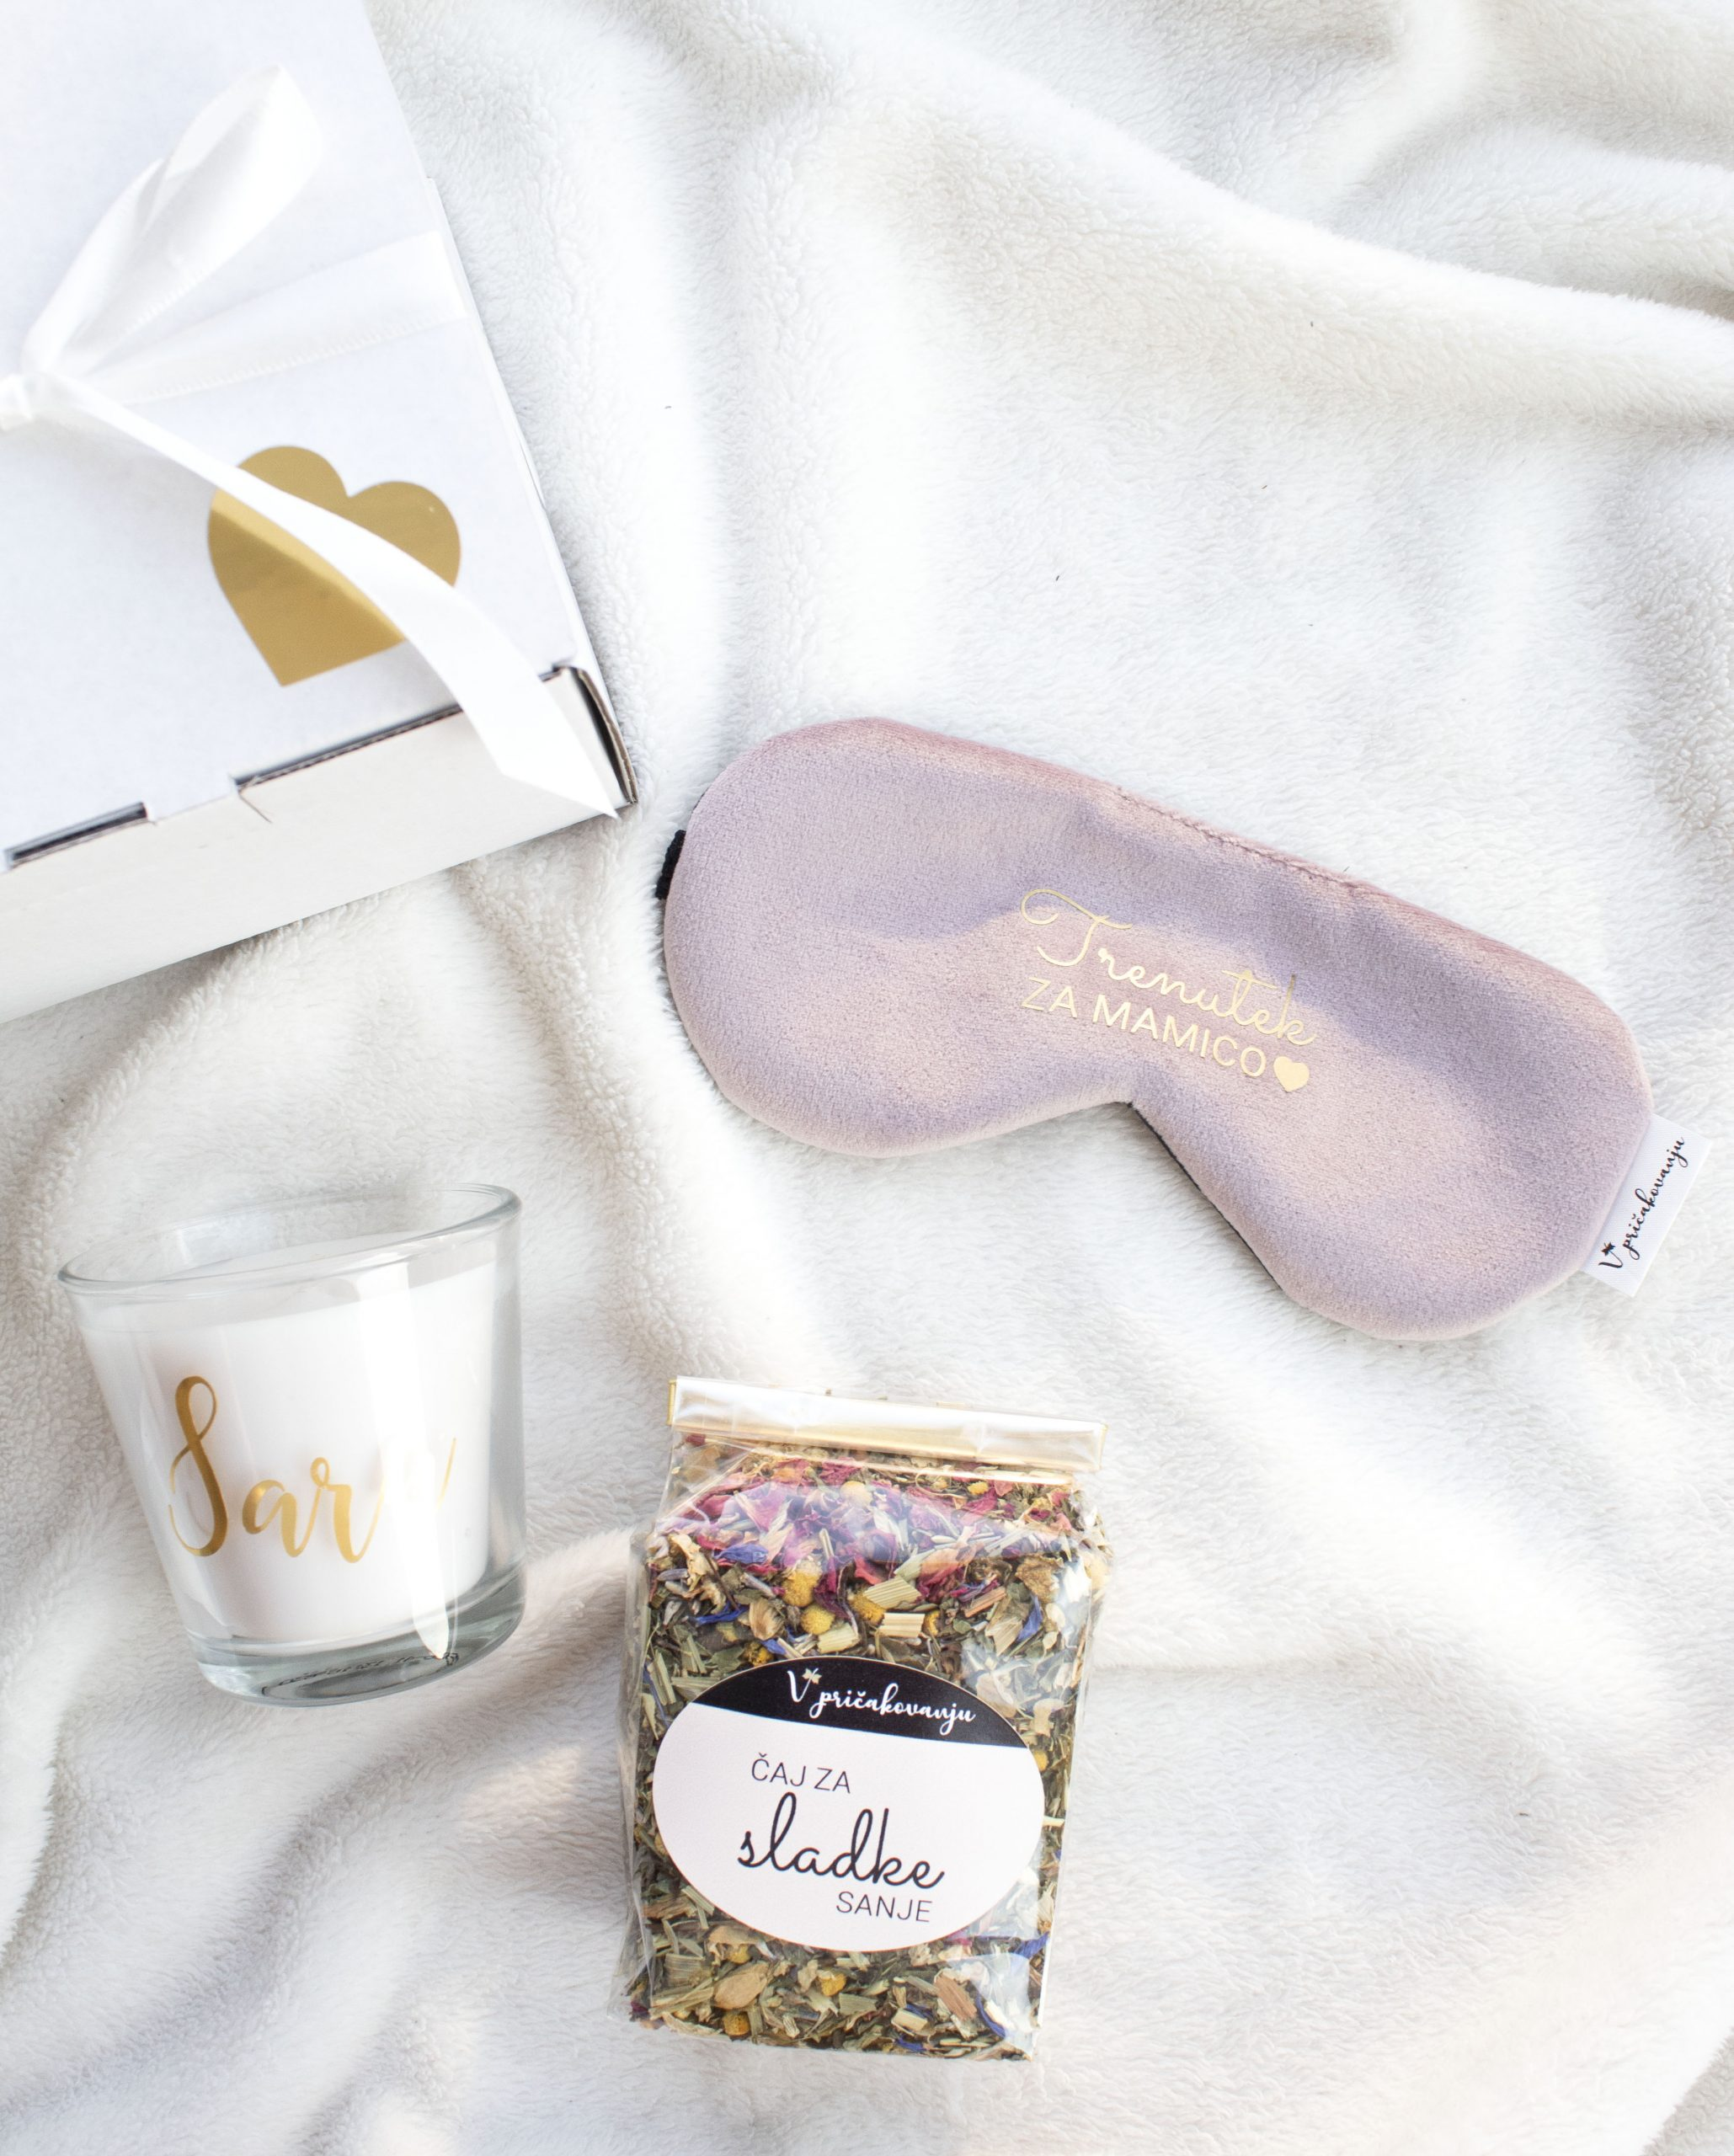 paket svečka (maska) 1